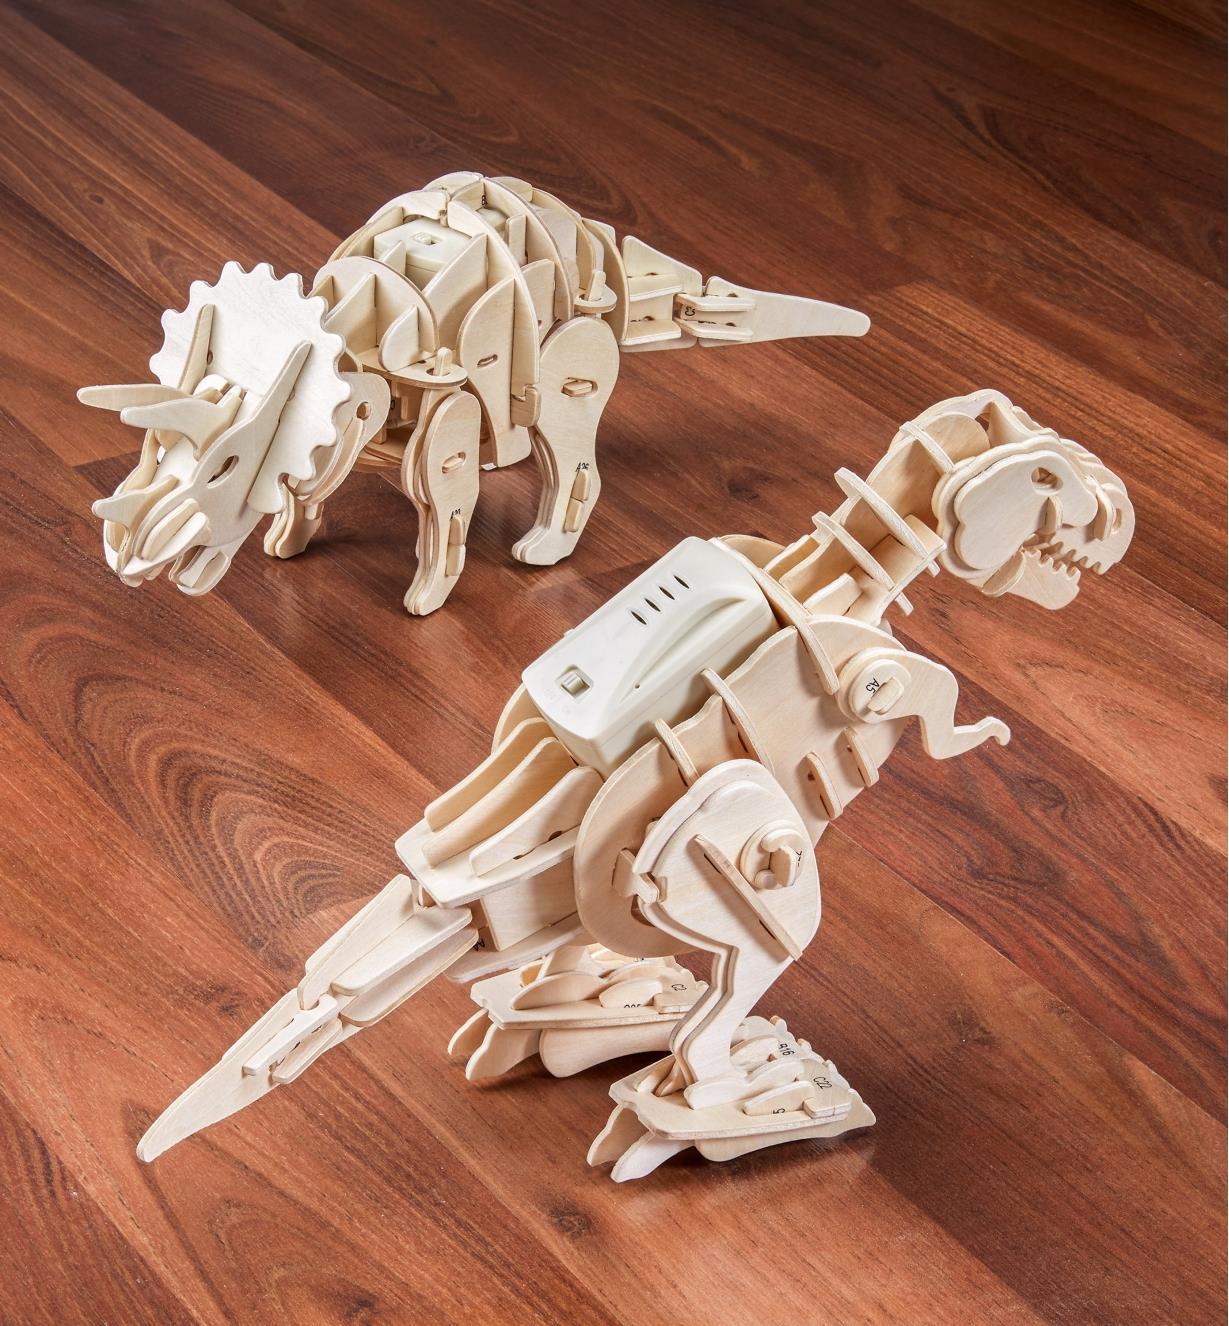 45K5042 - Walking Triceratops Model Kit